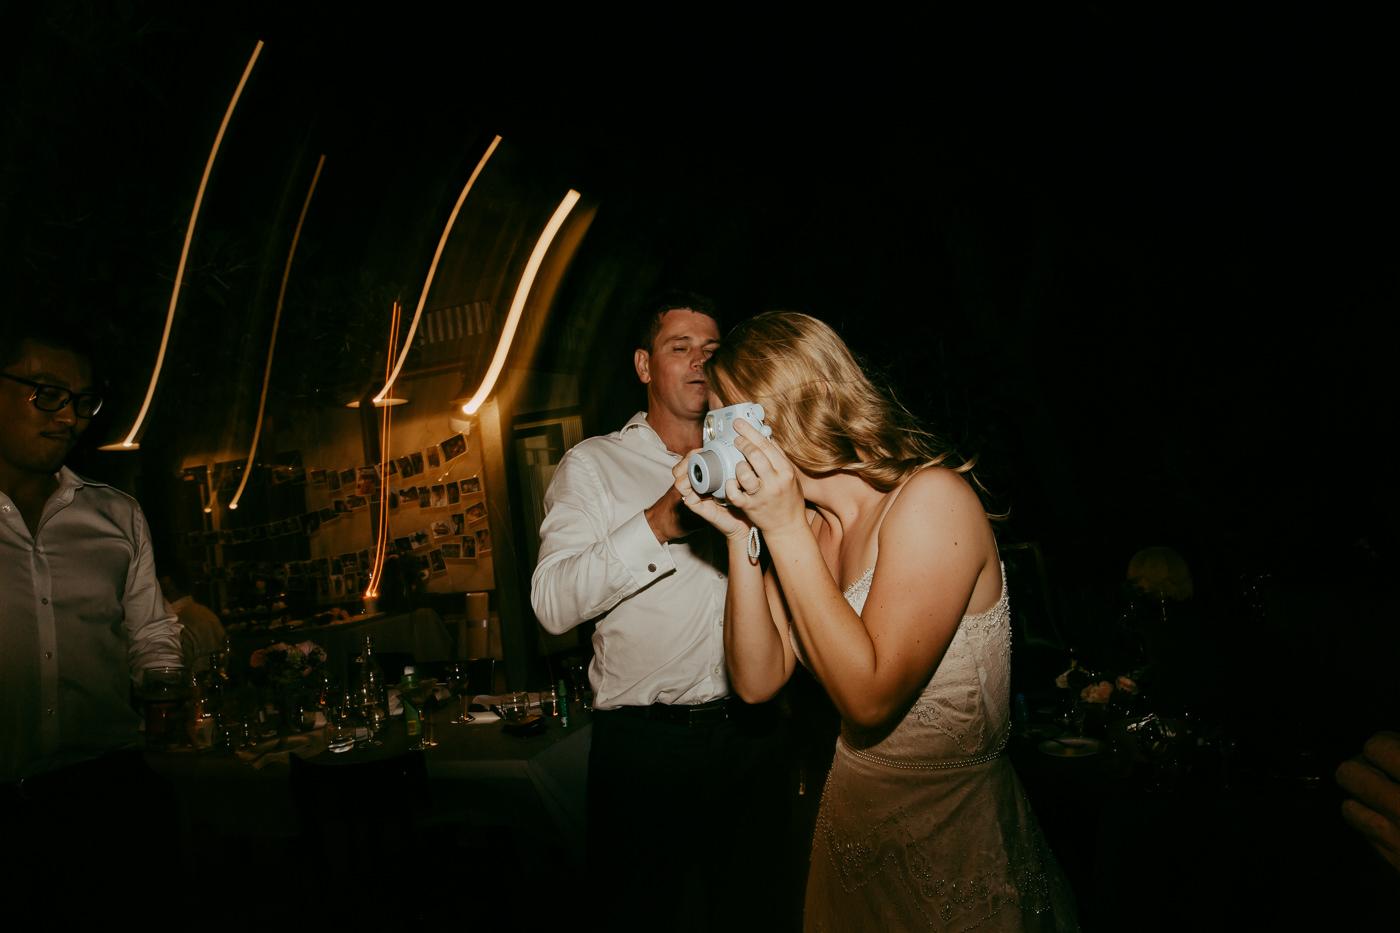 Anthony & Eliet - Wagga Wagga Wedding - Country NSW - Samantha Heather Photography-186.jpg